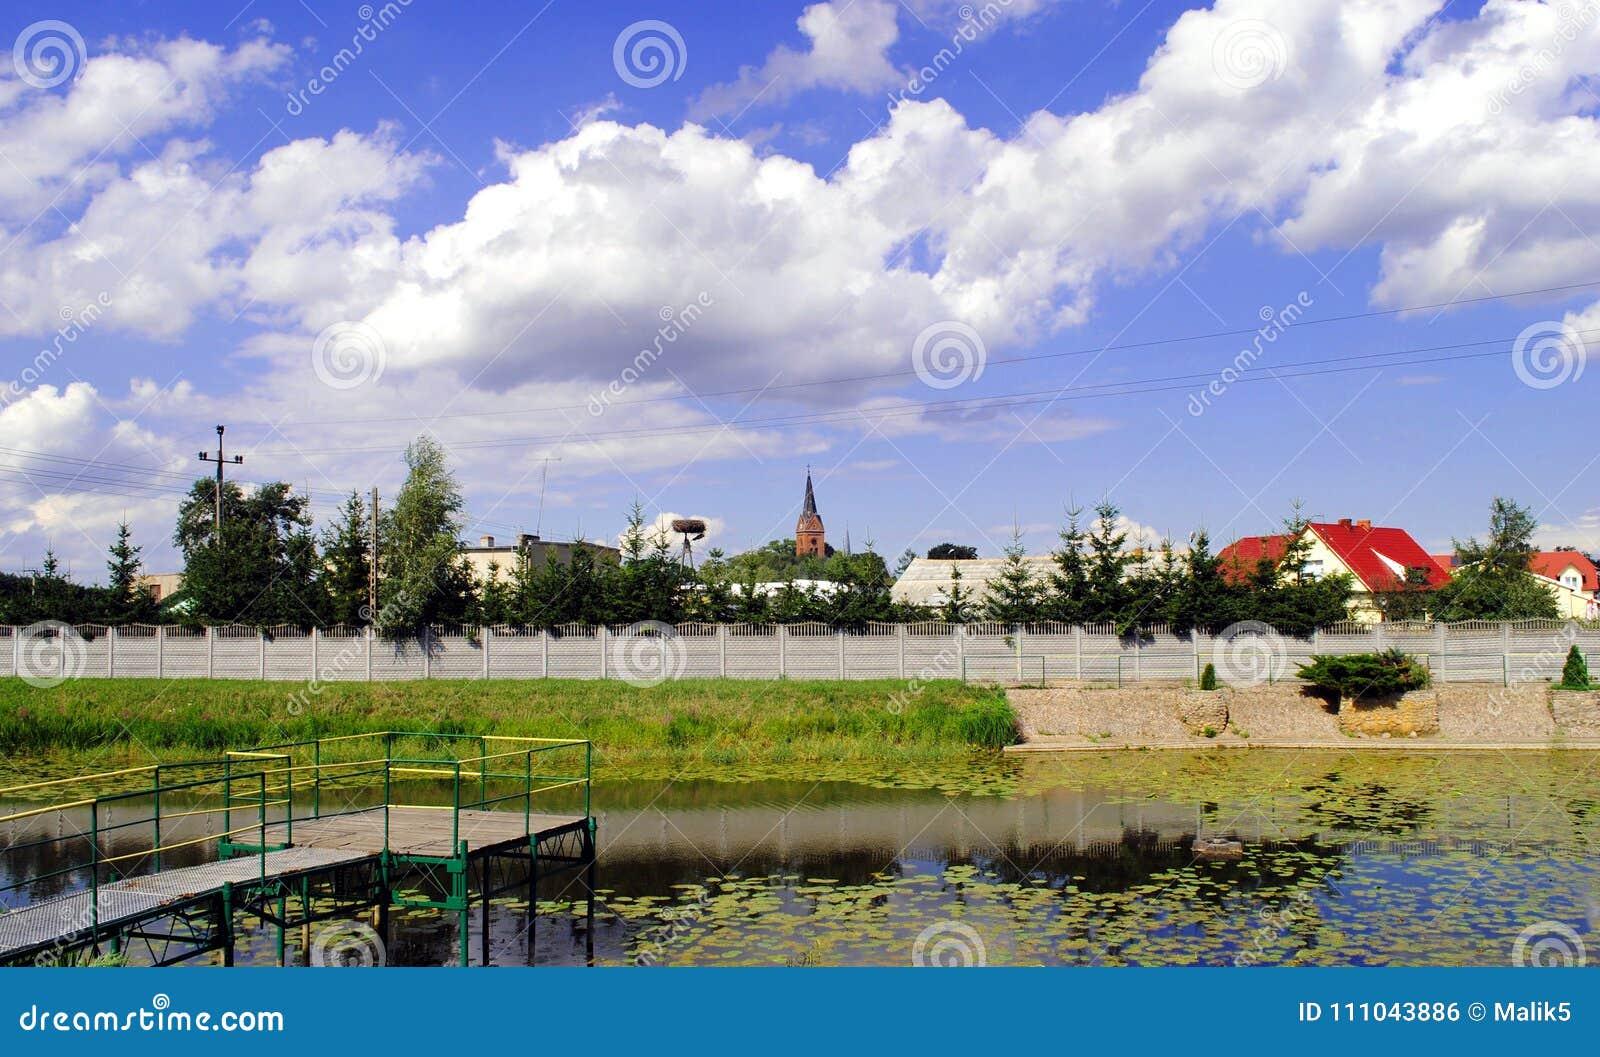 "Klein dorp dichtbij Å"" erkà ³ w in Jarocin-Provincie, Groter Polen Voivodeship, Polen"